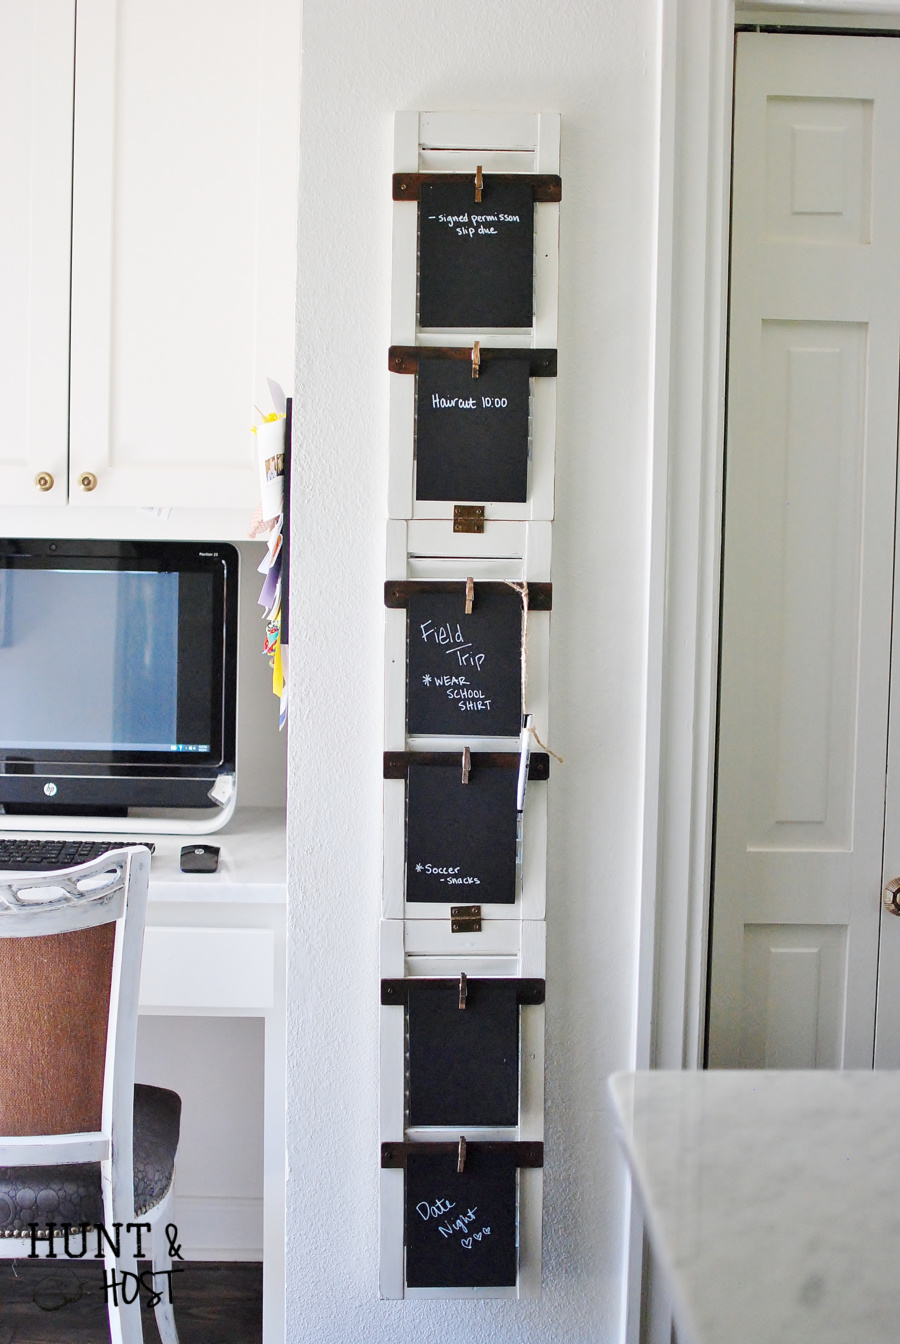 repurpose old shutters - Shutter To Do Board - huntandhost.net